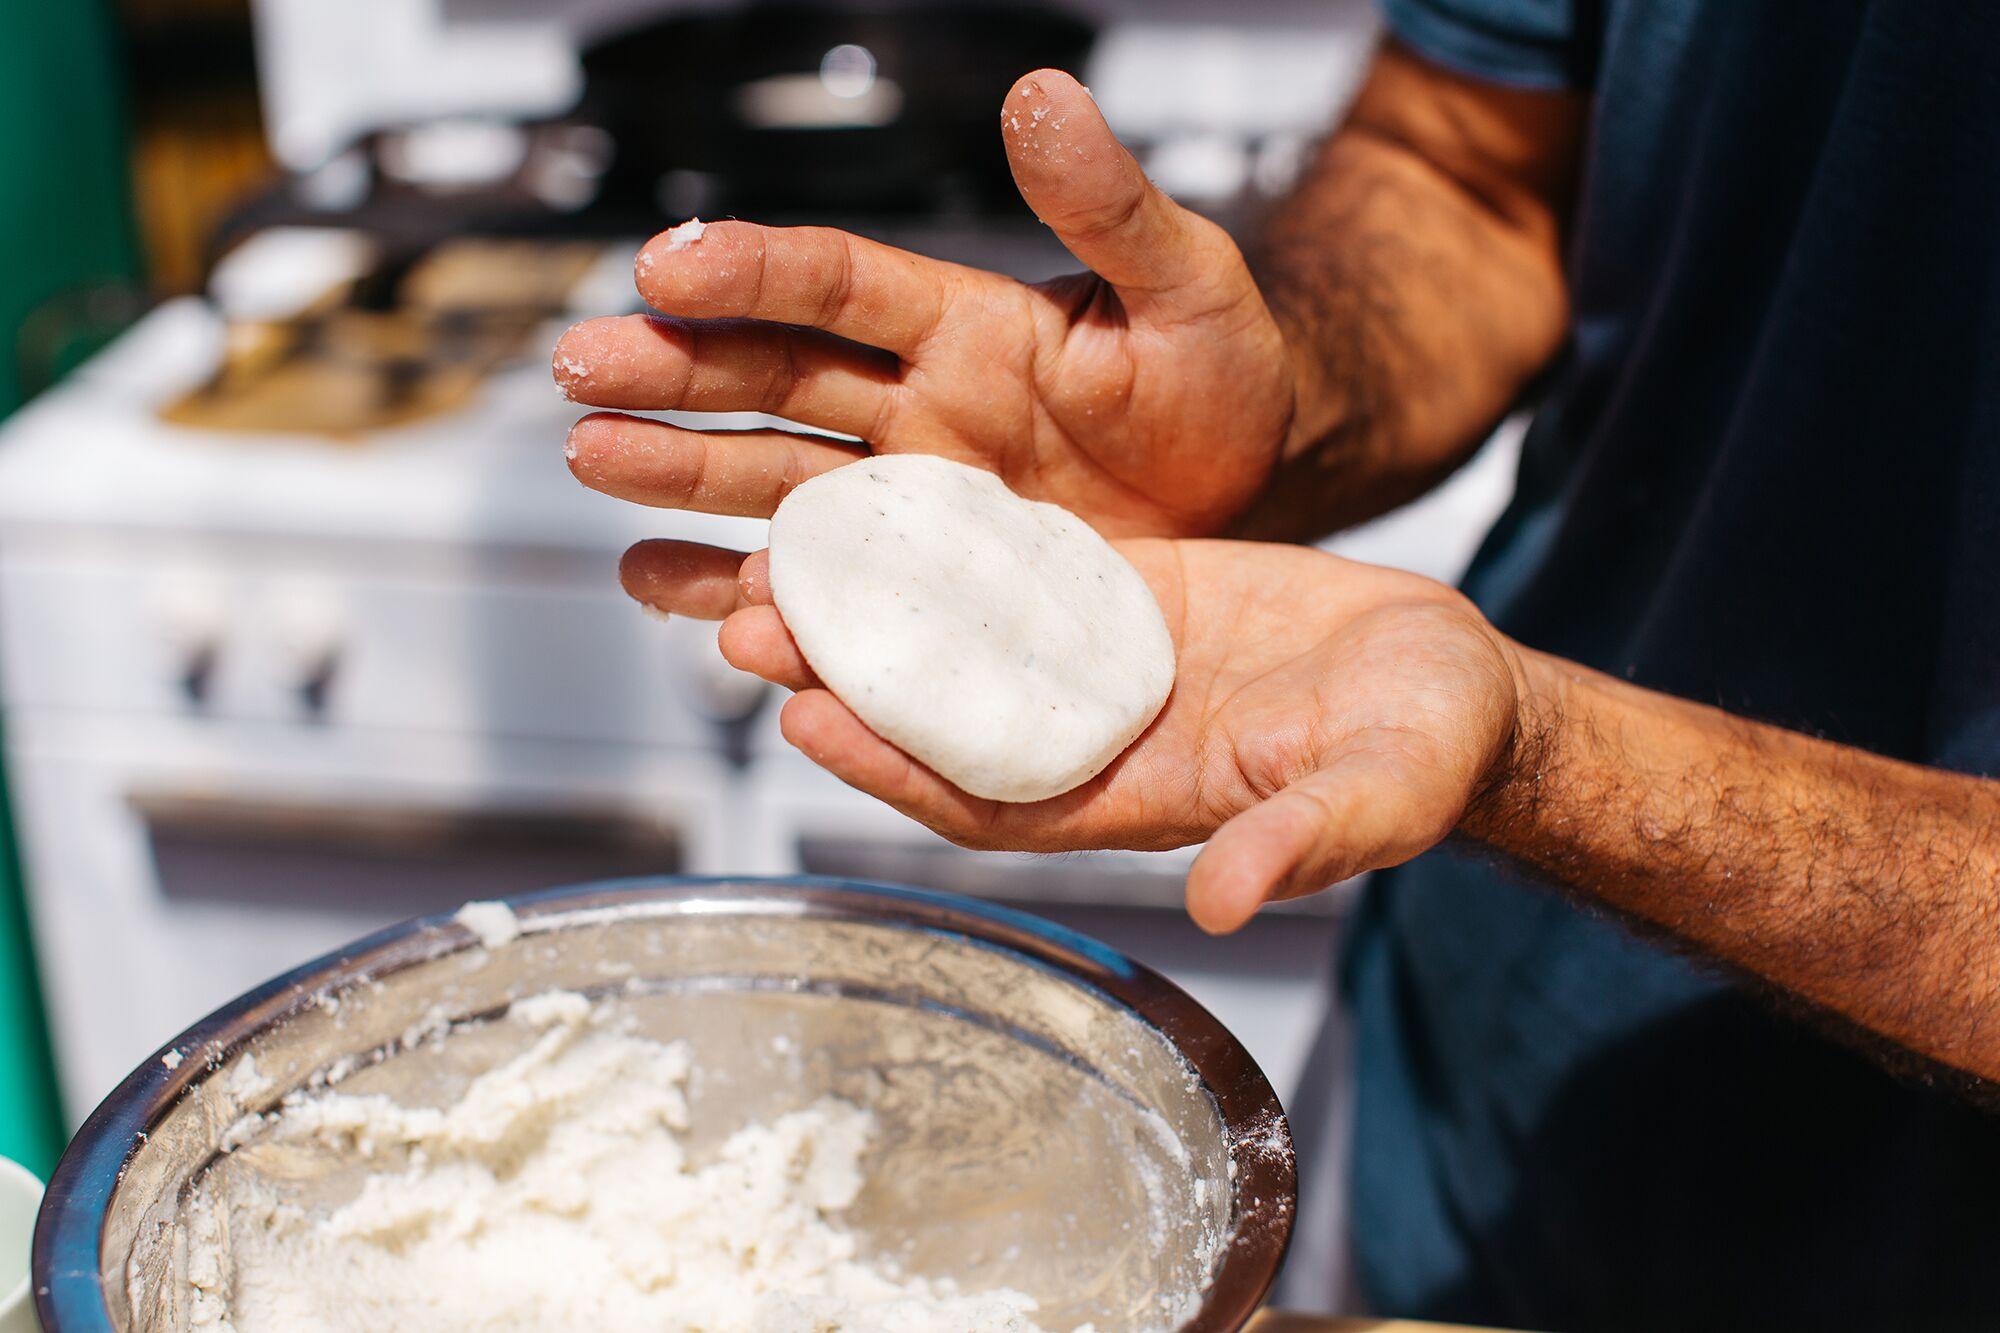 Chef Dario Tani shapes arepas